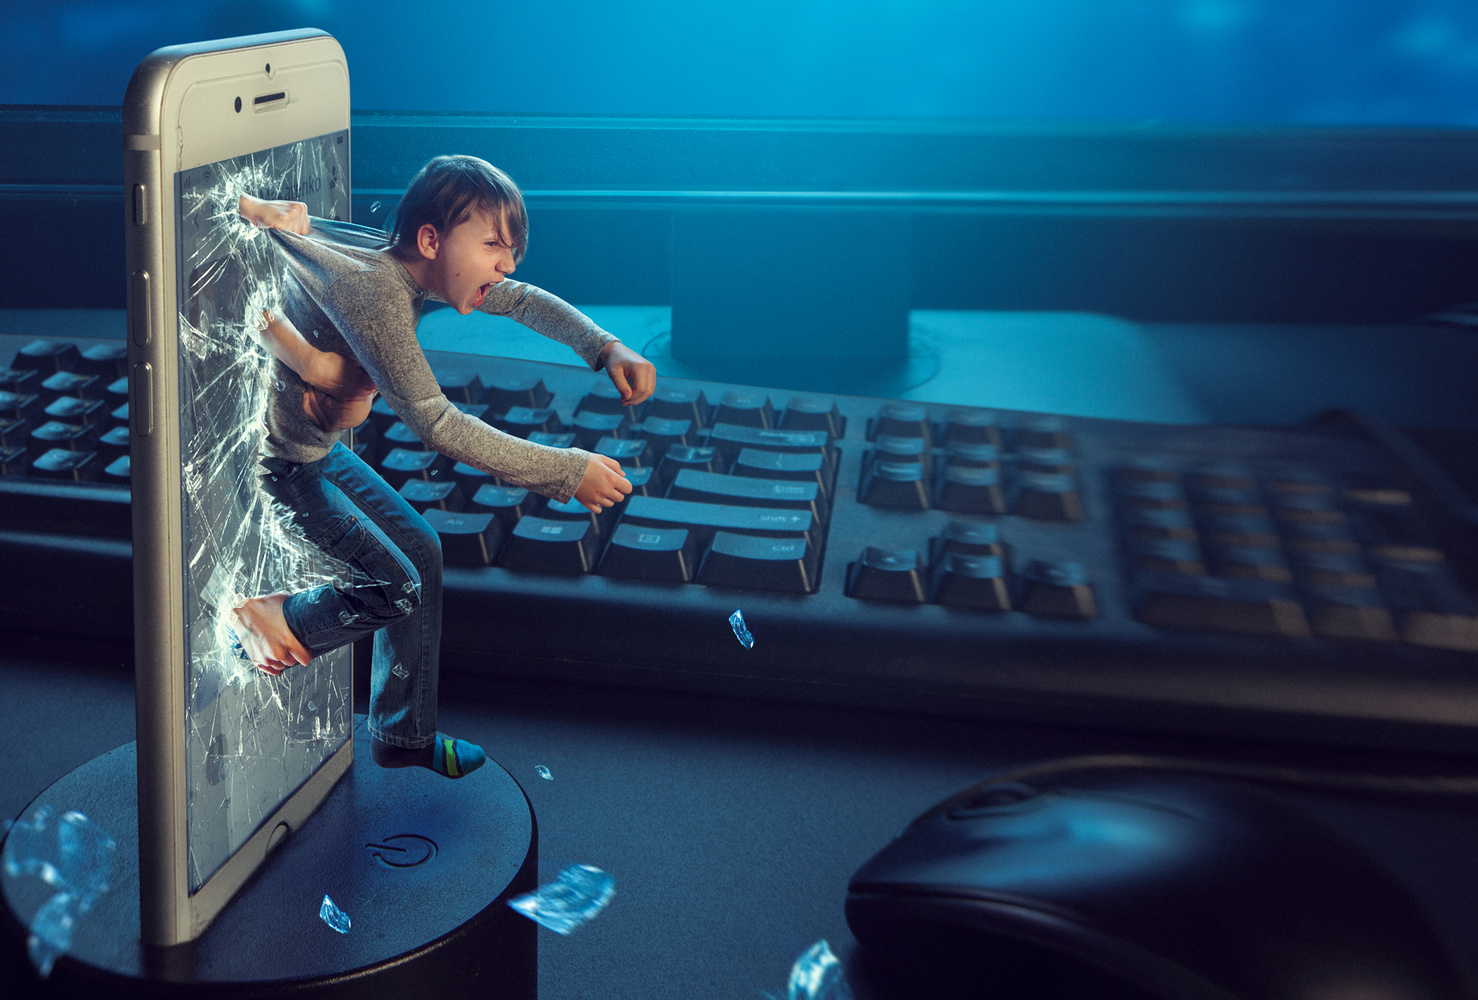 Escape from reality by Evgeny Loza